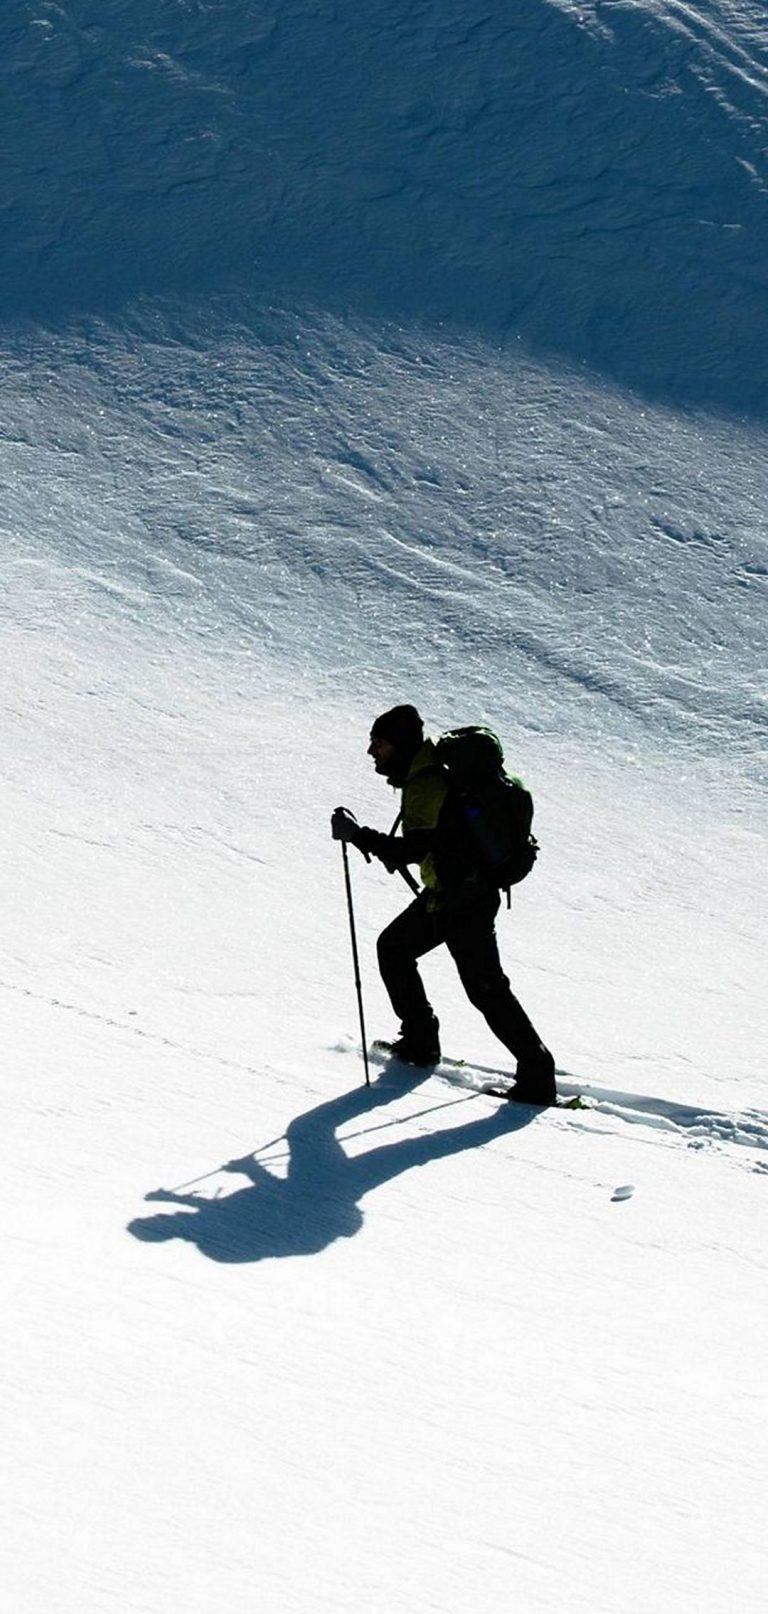 Skier Snow Climb Sport 1080x2270 768x1614